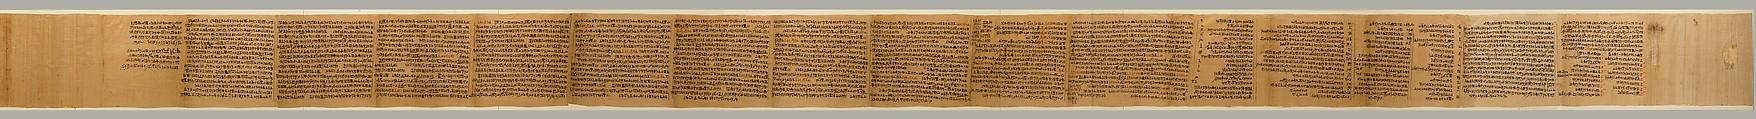 "Papyrus inscribed with six ""Osiris Liturgies"", Papyrus, ink"